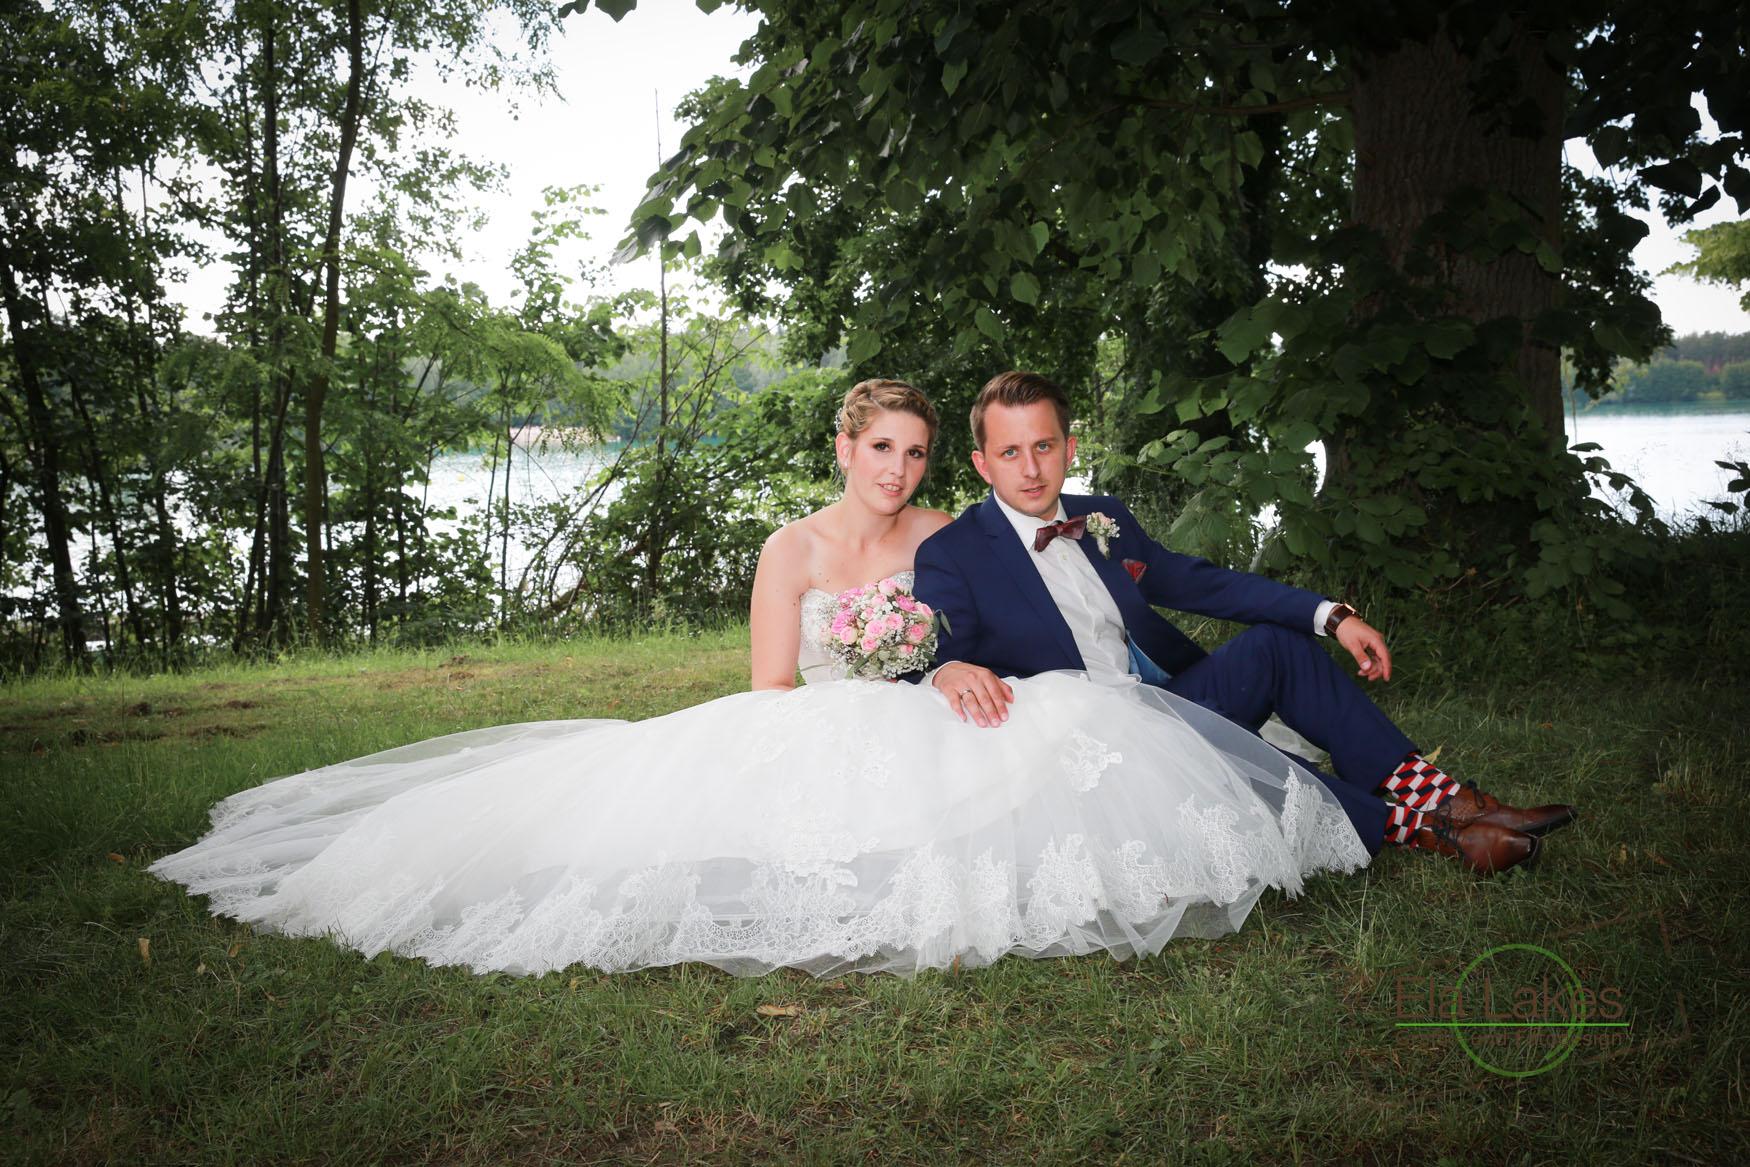 Hochzeitsfotograf Karlsruhe - ElaLakes Design - 1